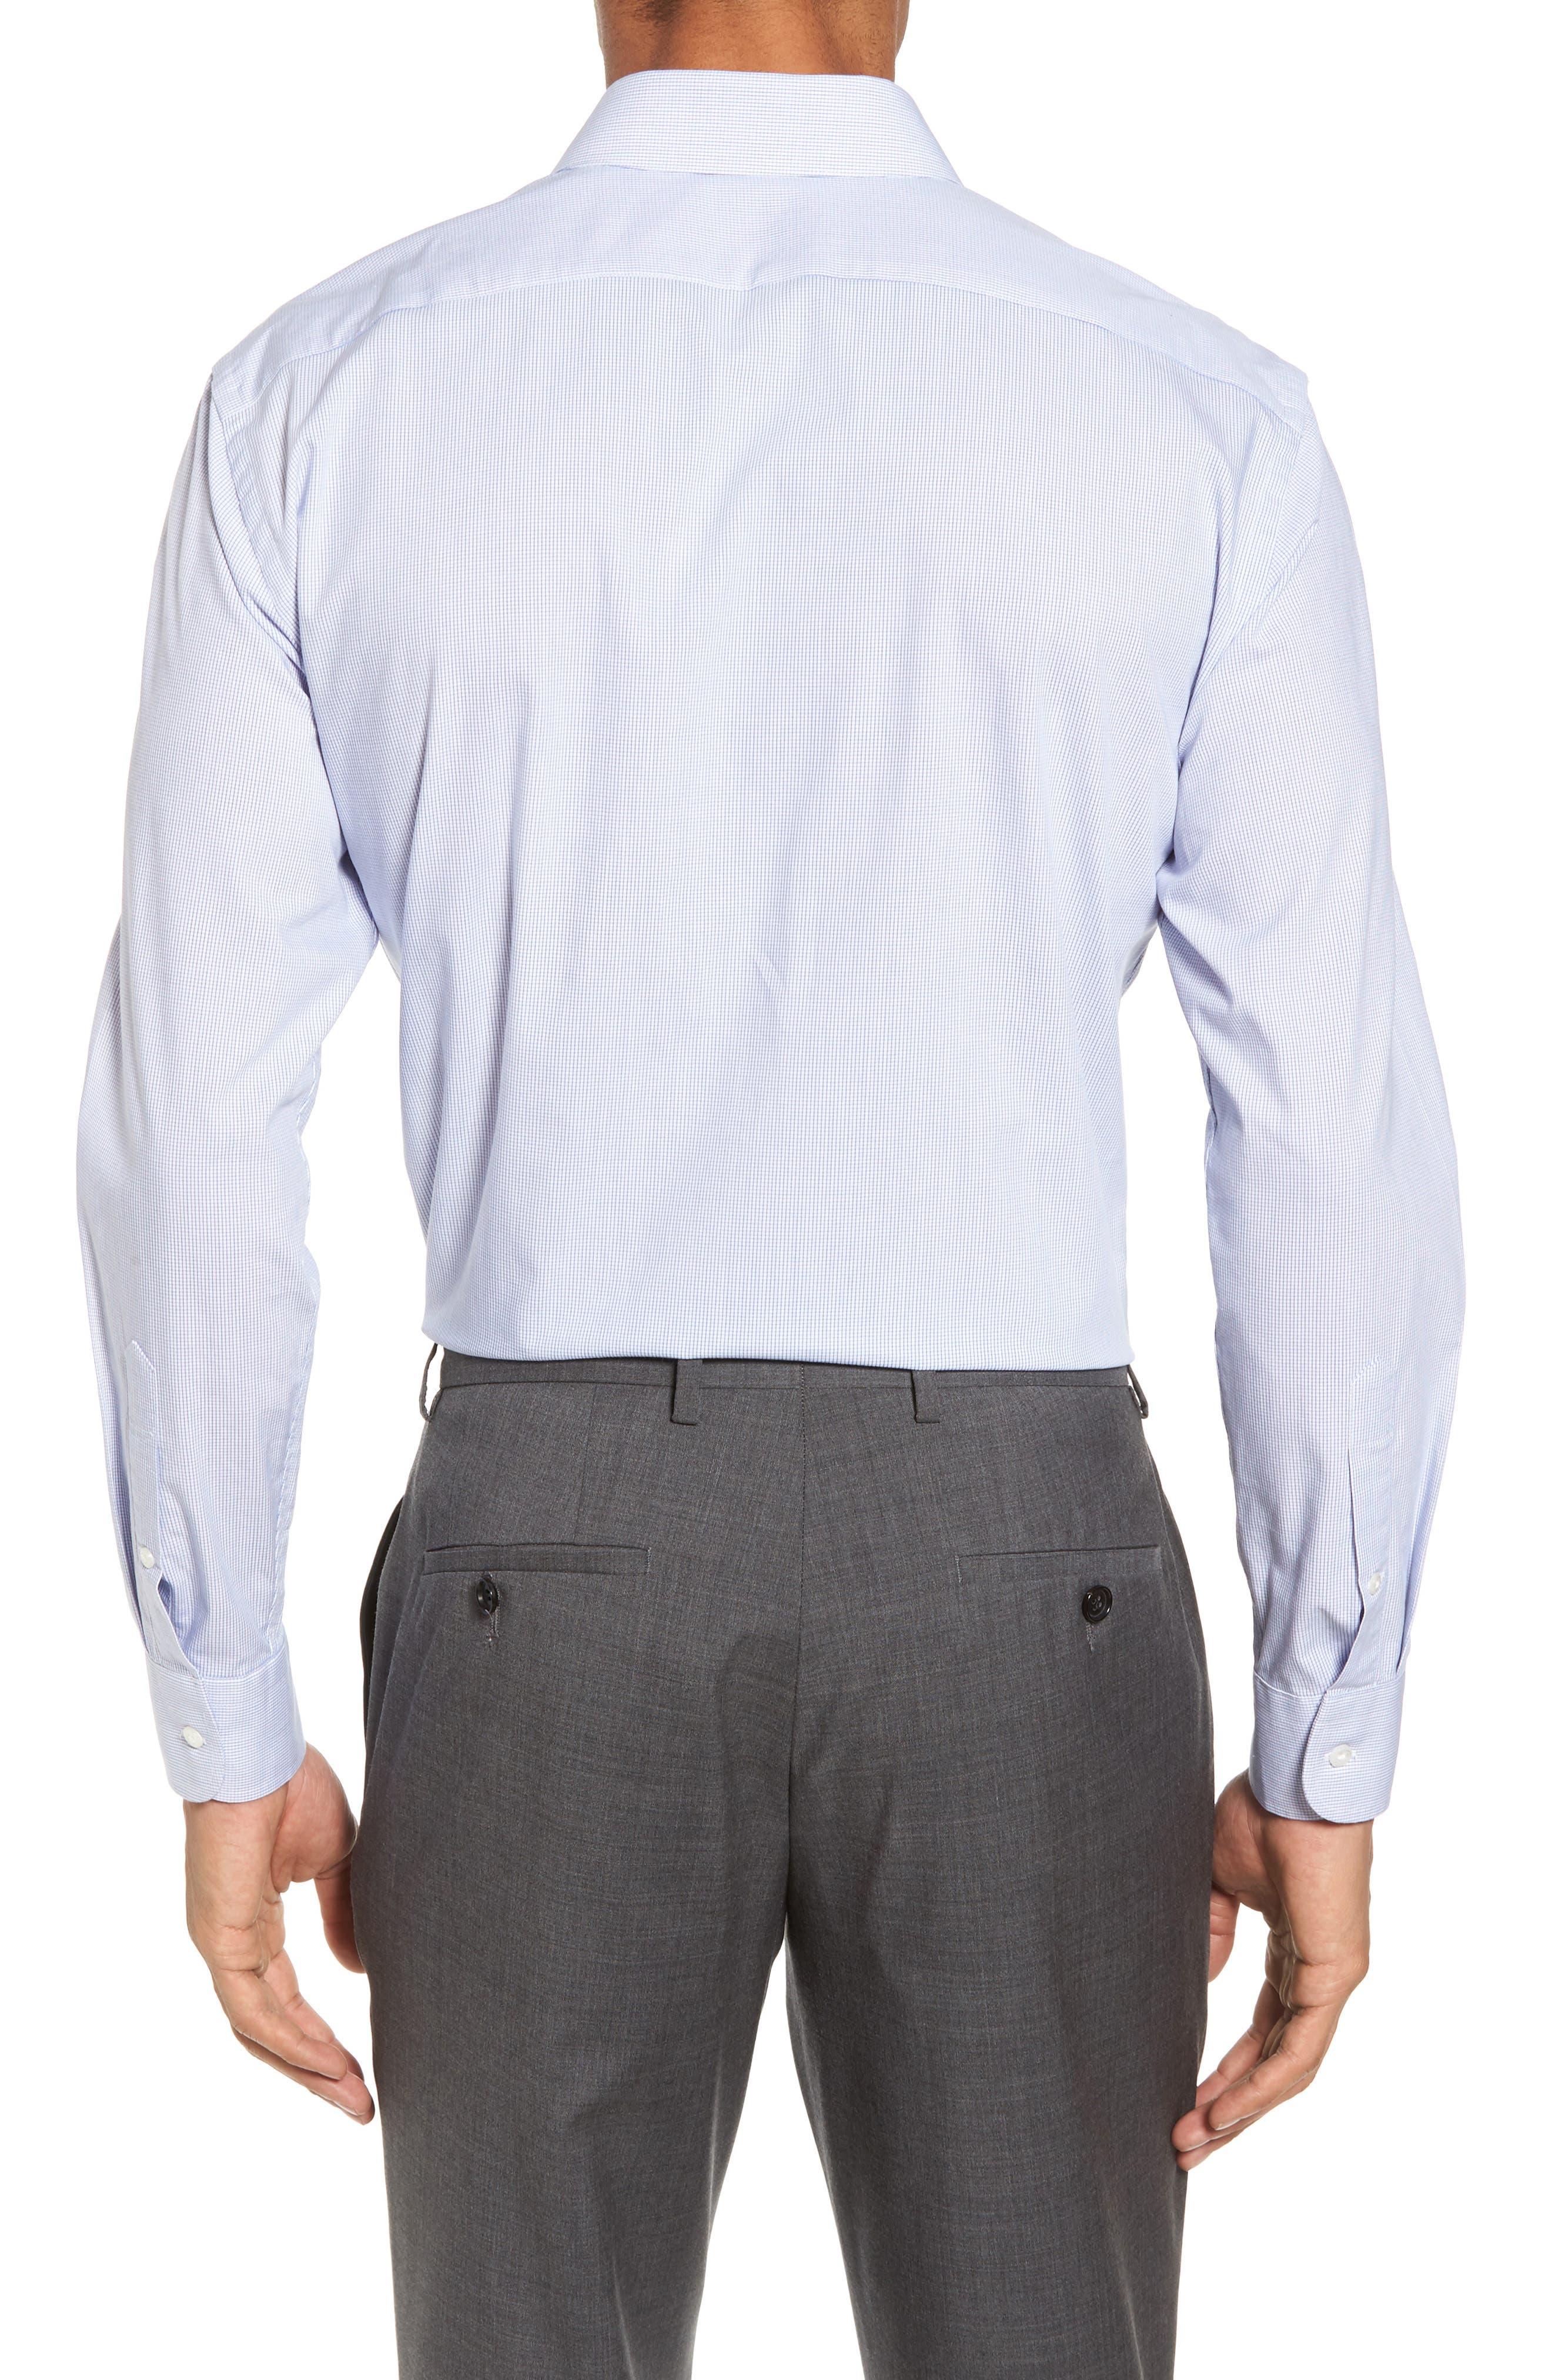 Tech-Smart Trim Fit Stretch Tattersall Dress Shirt,                             Alternate thumbnail 2, color,                             401